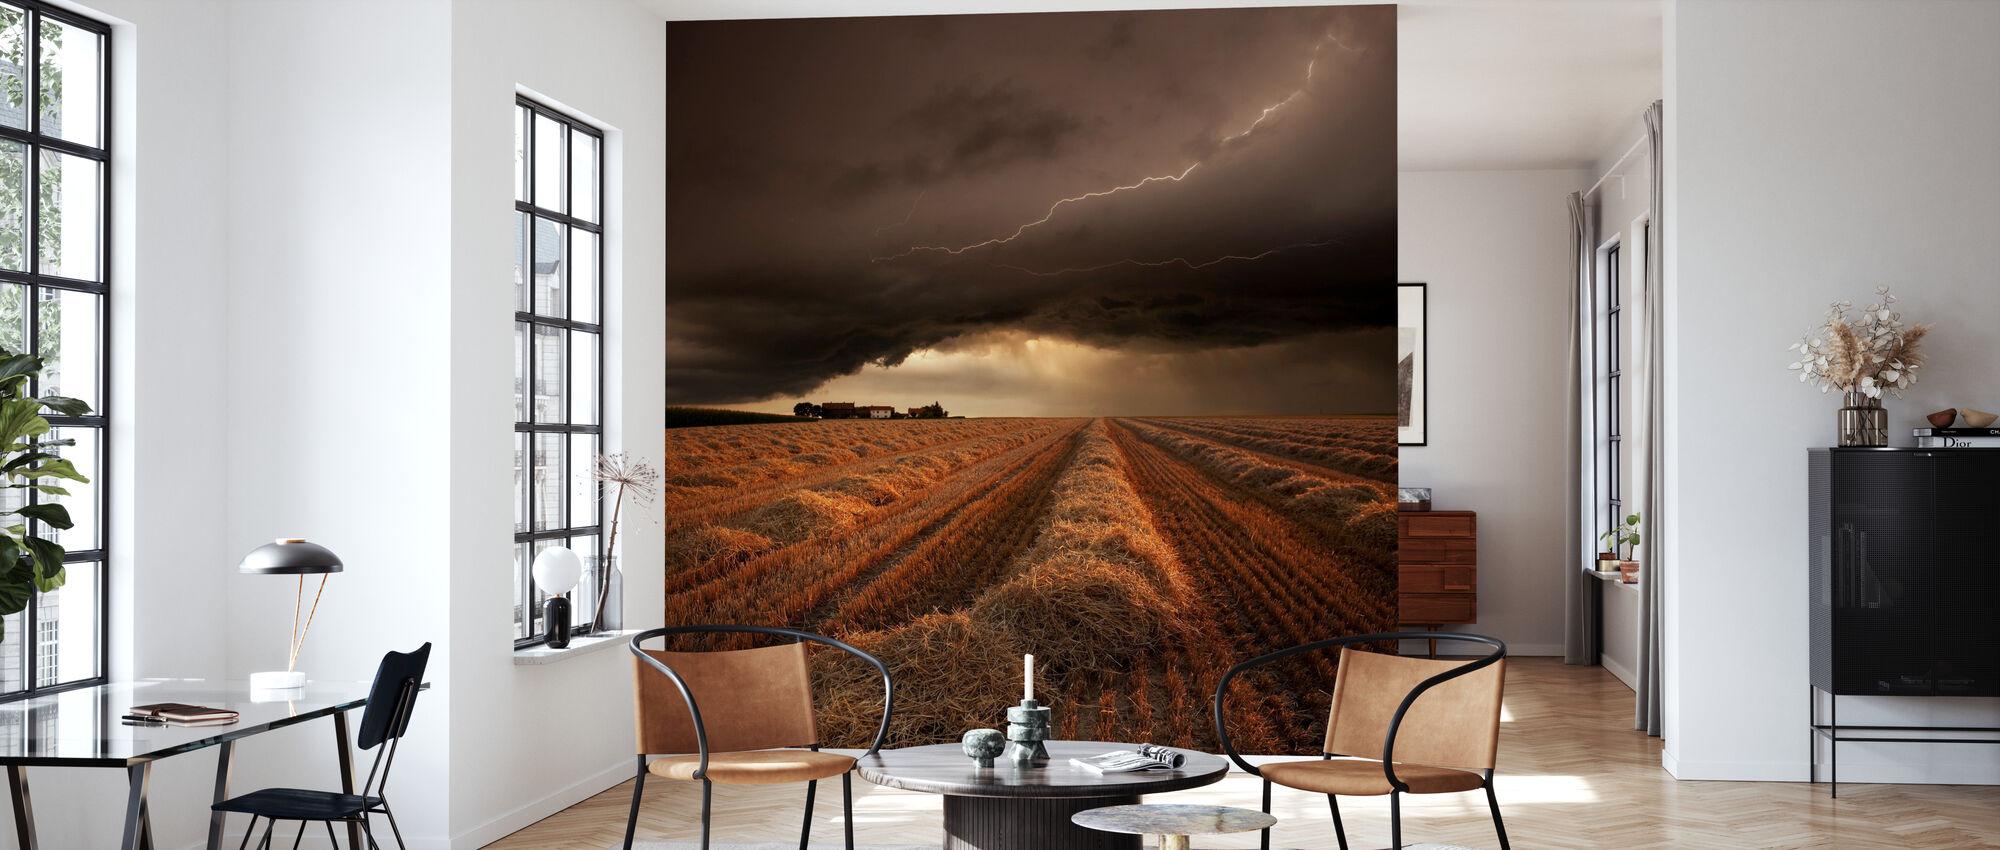 Dramatic Thunderstorm - Wallpaper - Living Room